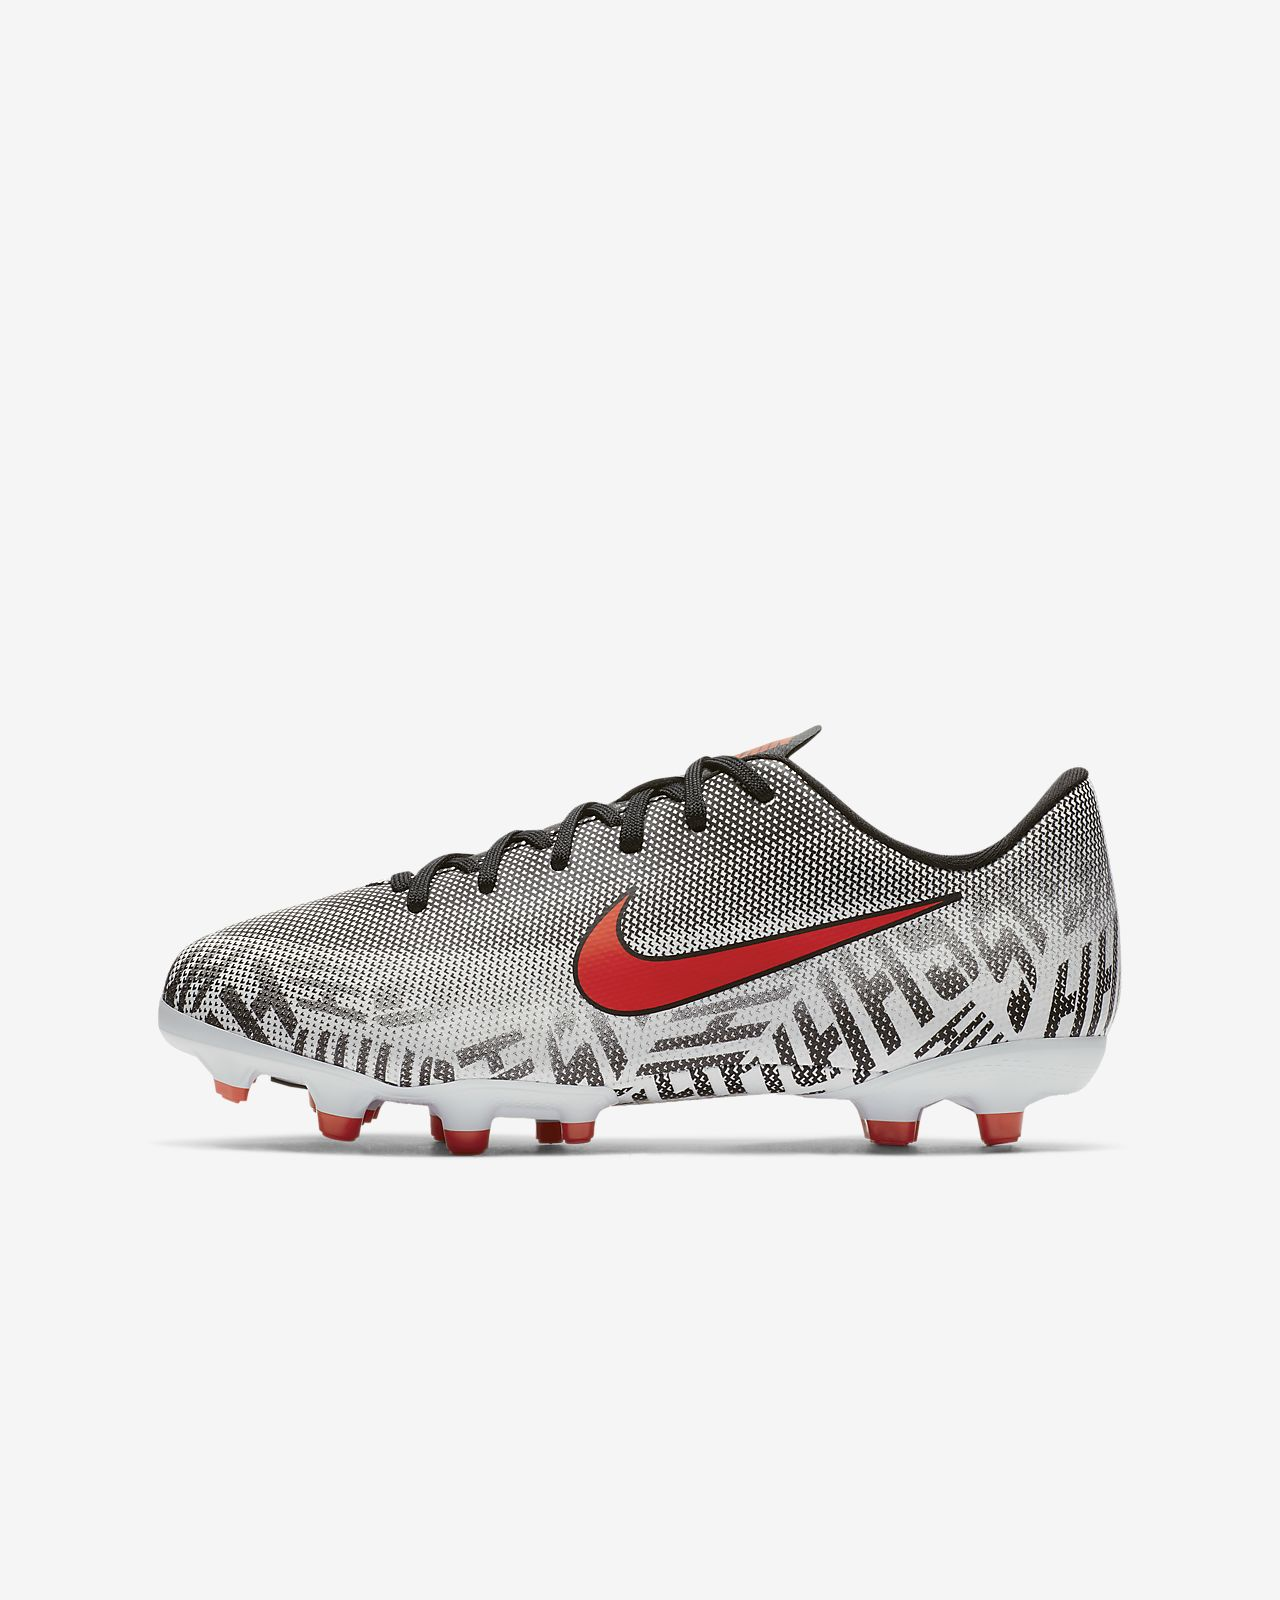 33fe1bab72a ... Calzado de fútbol para múltiples superficies para niños talla  pequeña/grande Nike Jr. Mercurial